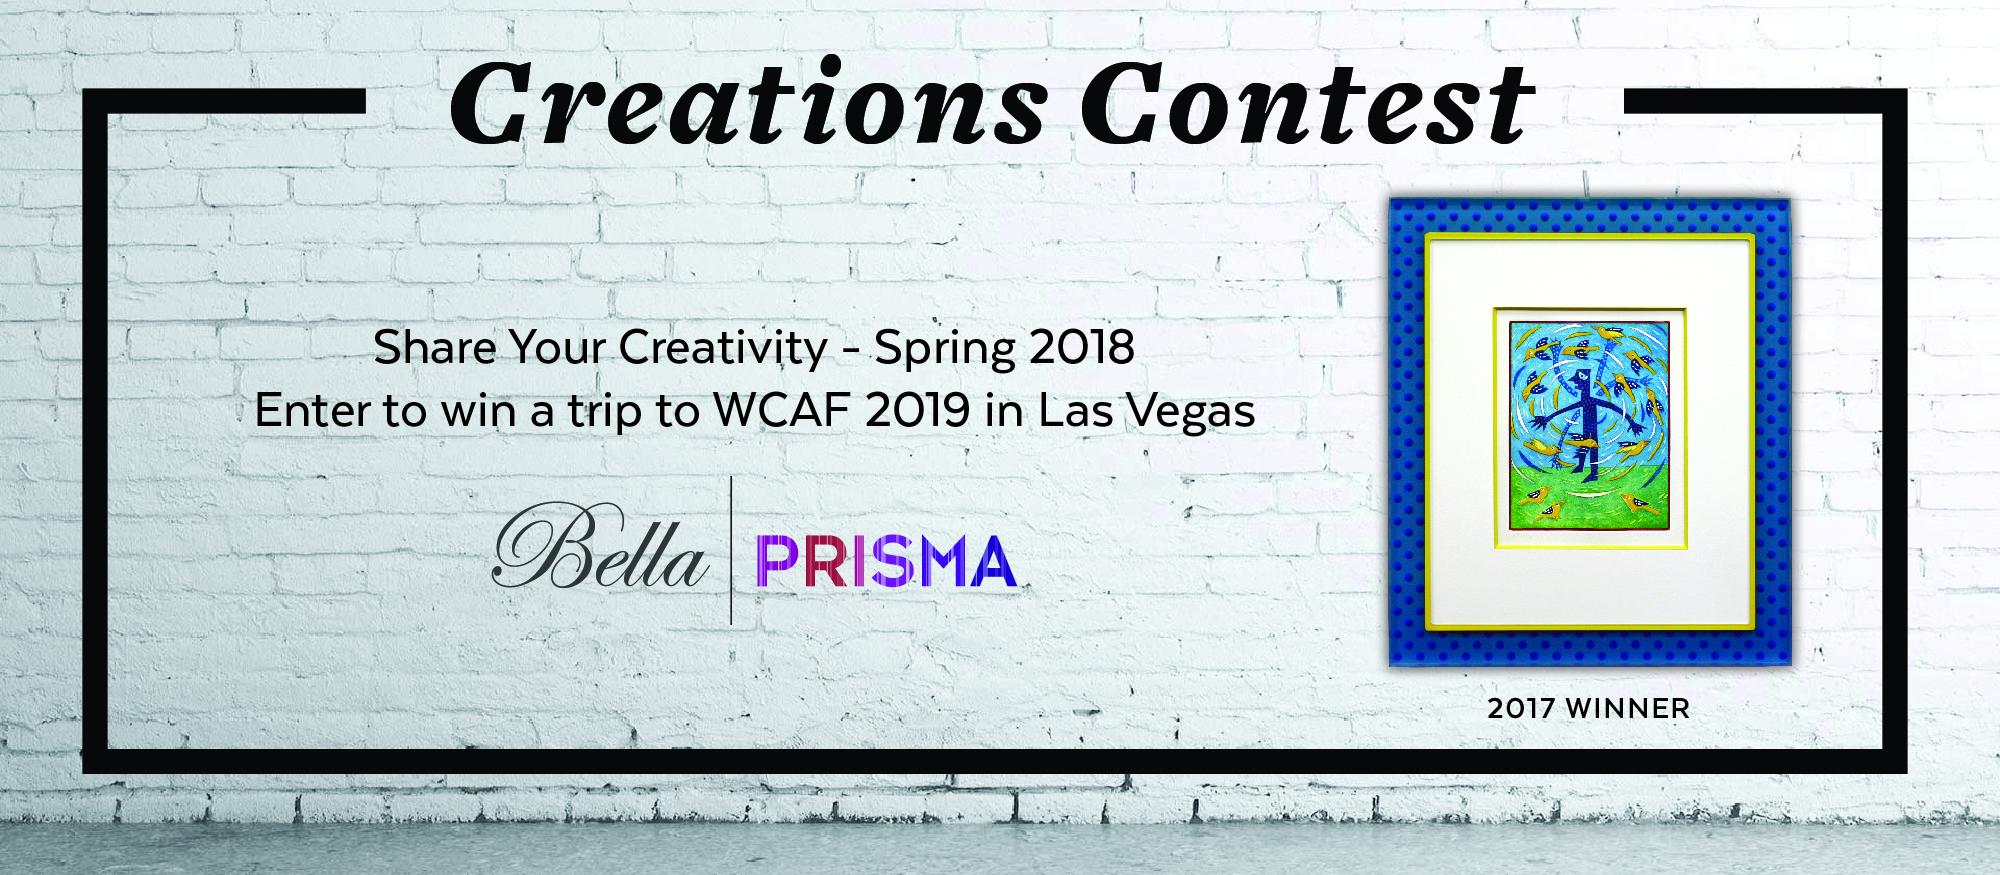 bella_creations_facebook_2018.jpg